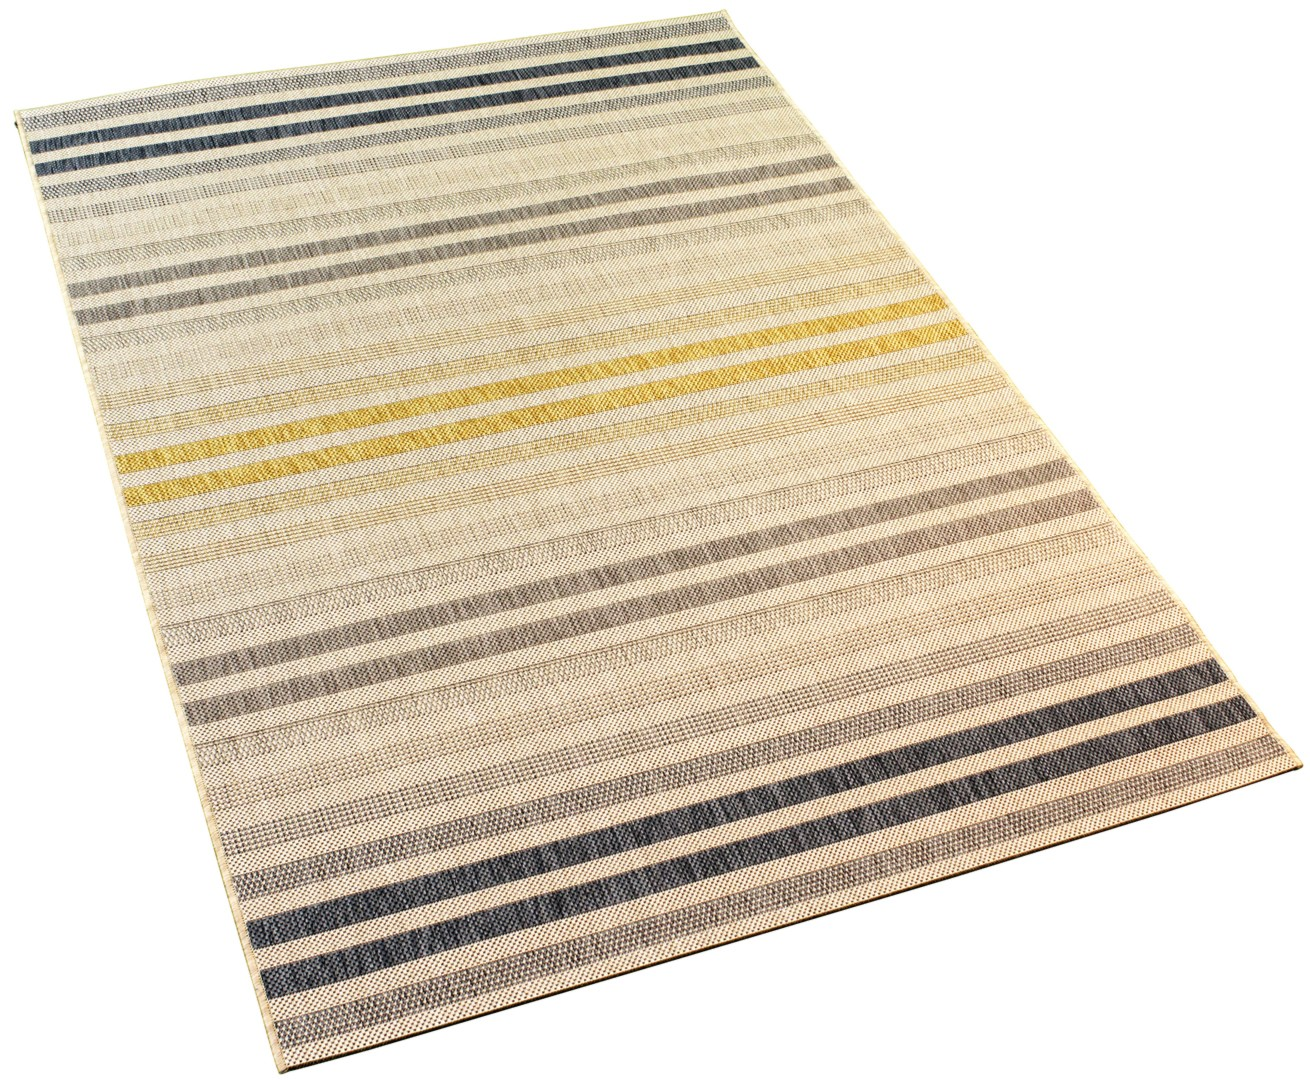 tapis plat moderne int rieur et ext rieur en polypropyl ne bleu tusso. Black Bedroom Furniture Sets. Home Design Ideas